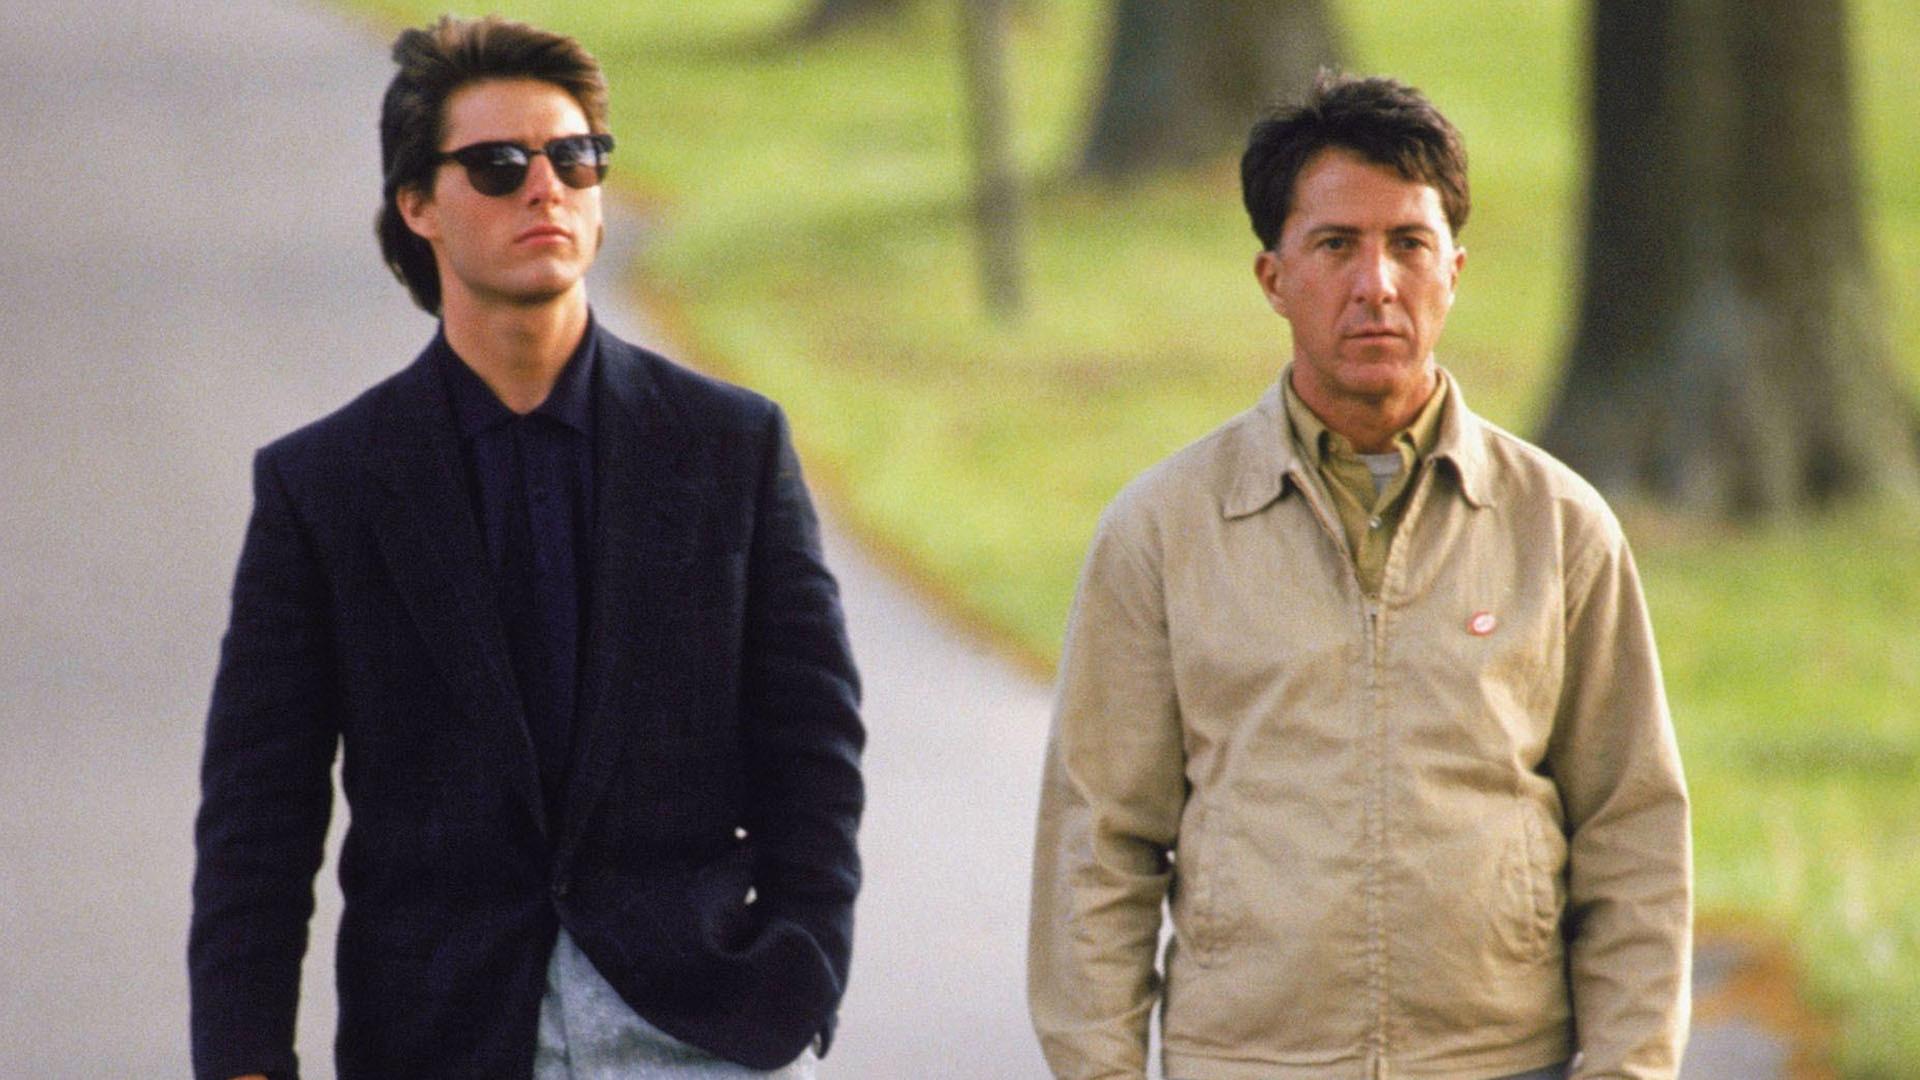 Tom Cruise and Dustin Hoffman in Rain Man